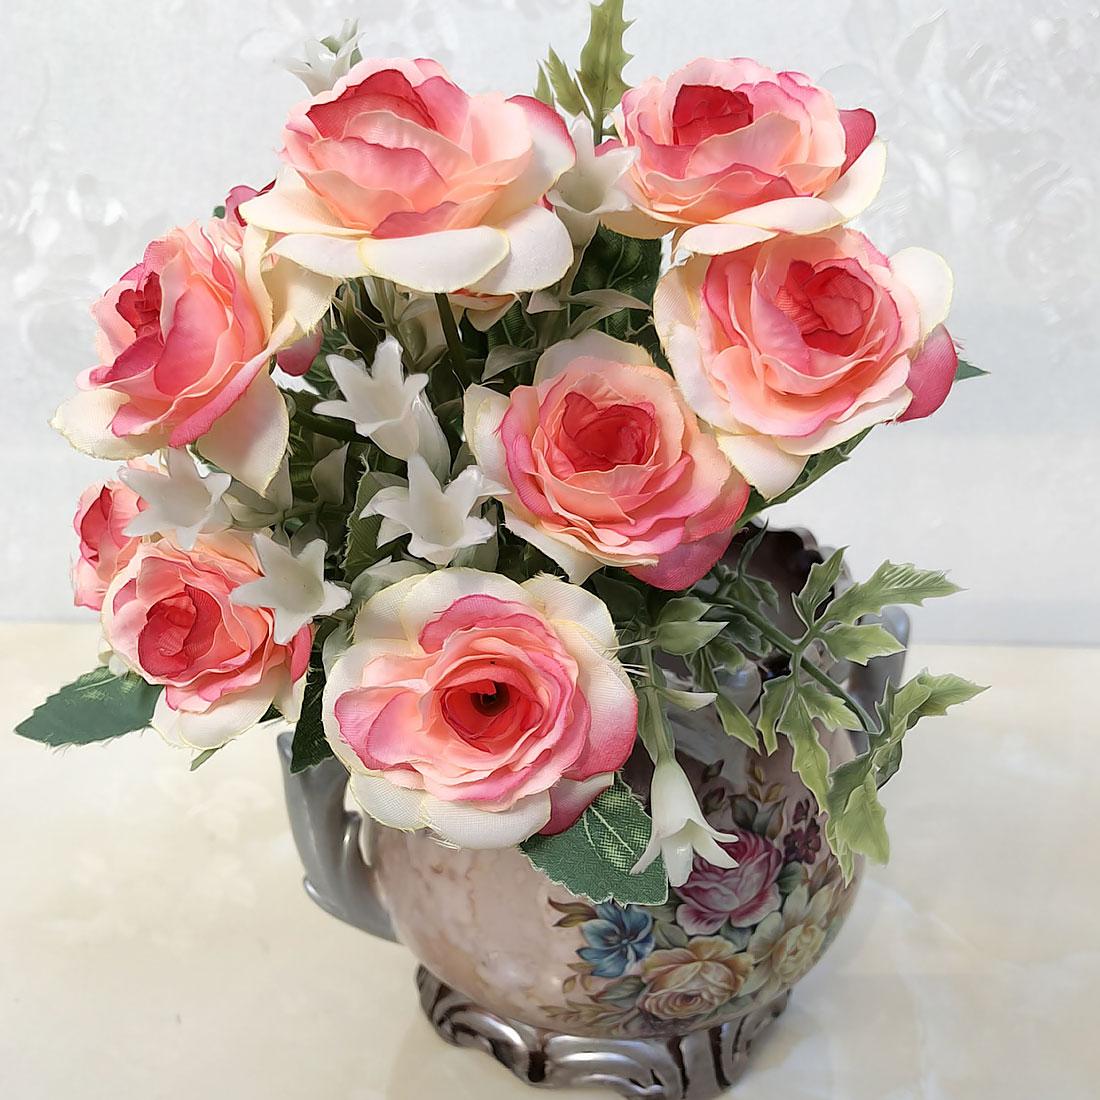 Artificial Flower 10 15 heads French Rose Floral Bouquet Fake Flower Arrange Table Decor Silk Rose Wedding Flores